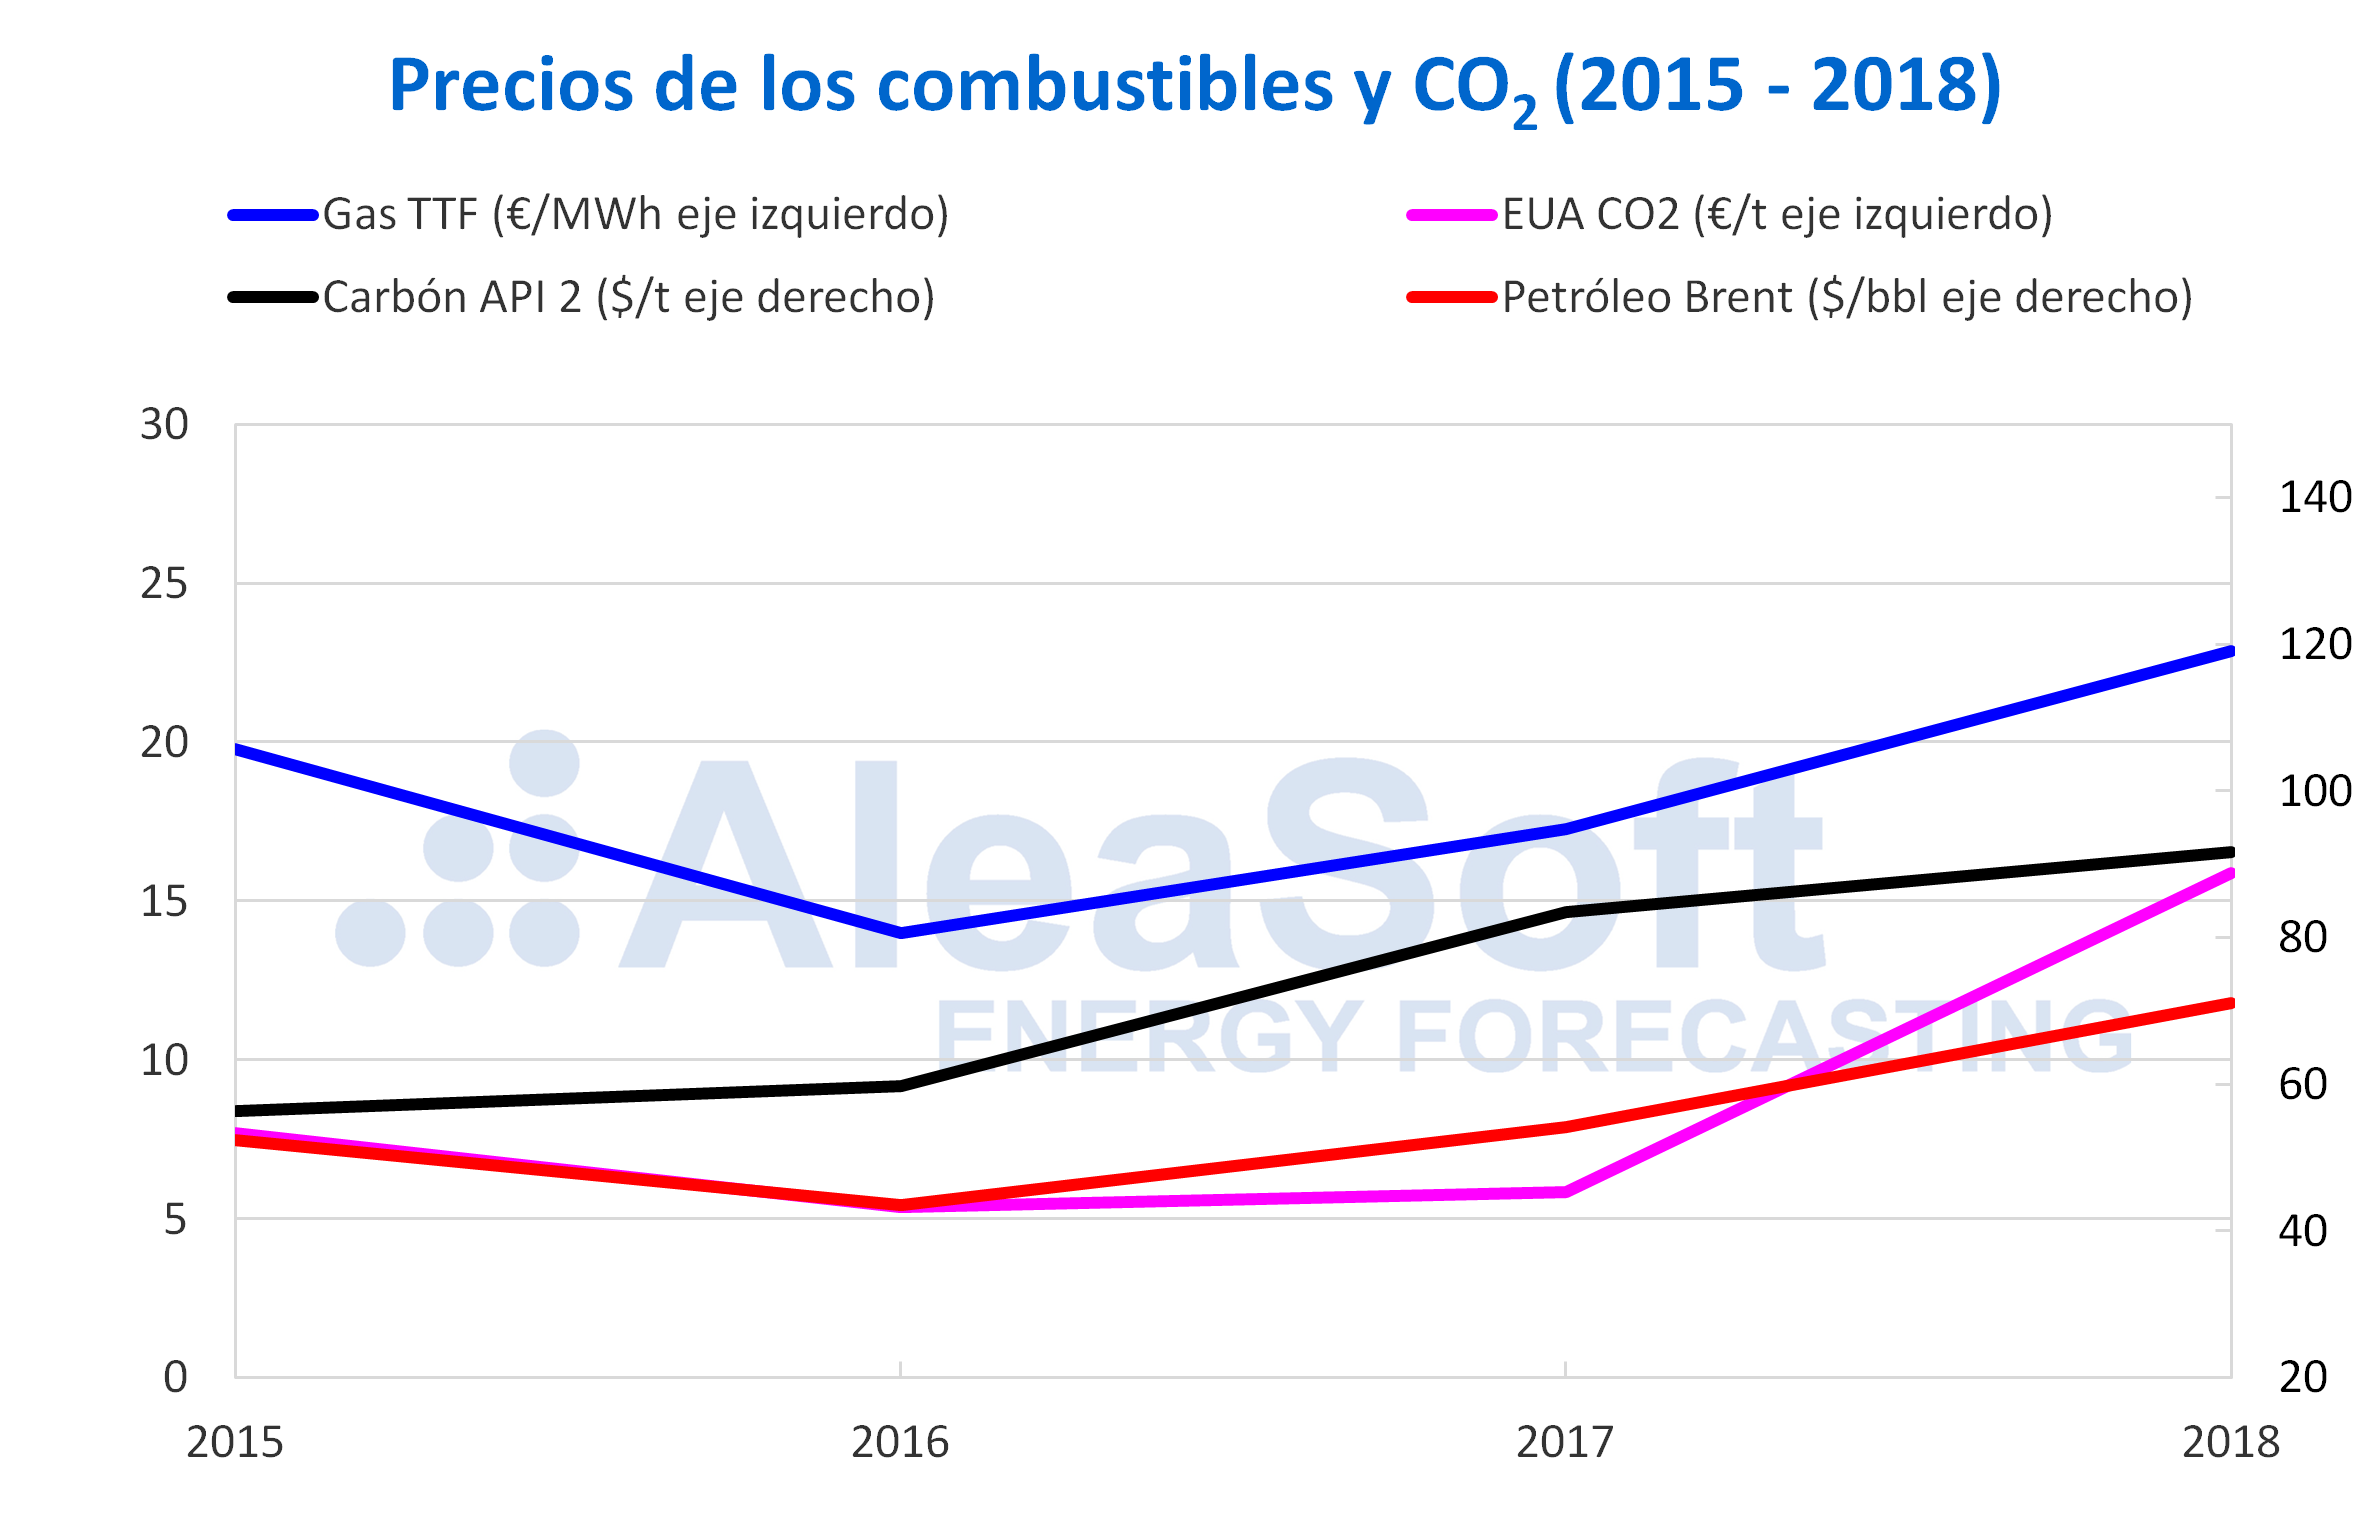 AleaSoft - Precios gas carbón Brent CO2 2015-2018